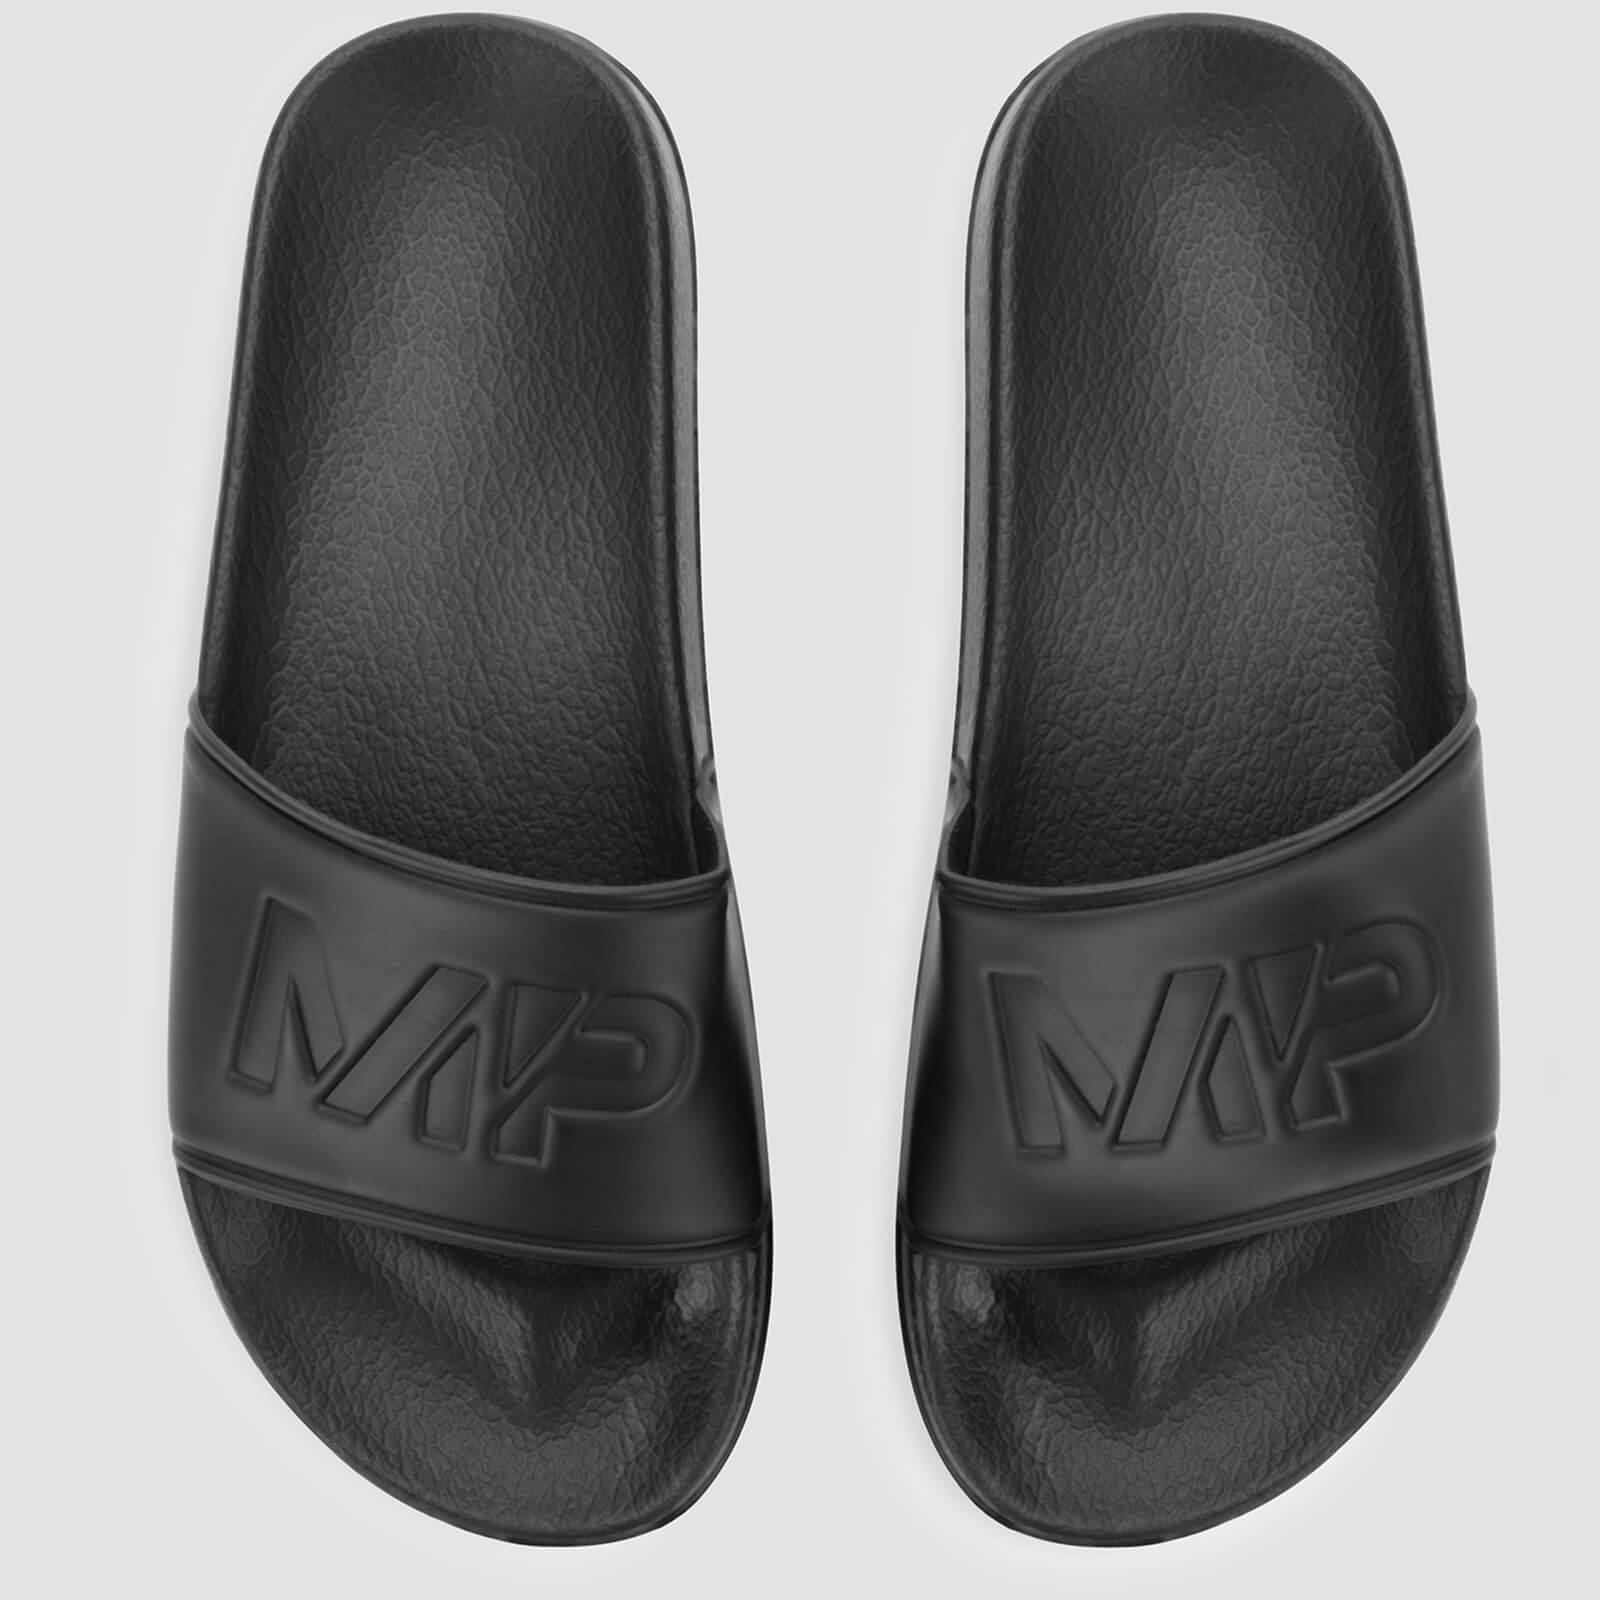 Myprotein MP Men's Sliders - Black - UK 7